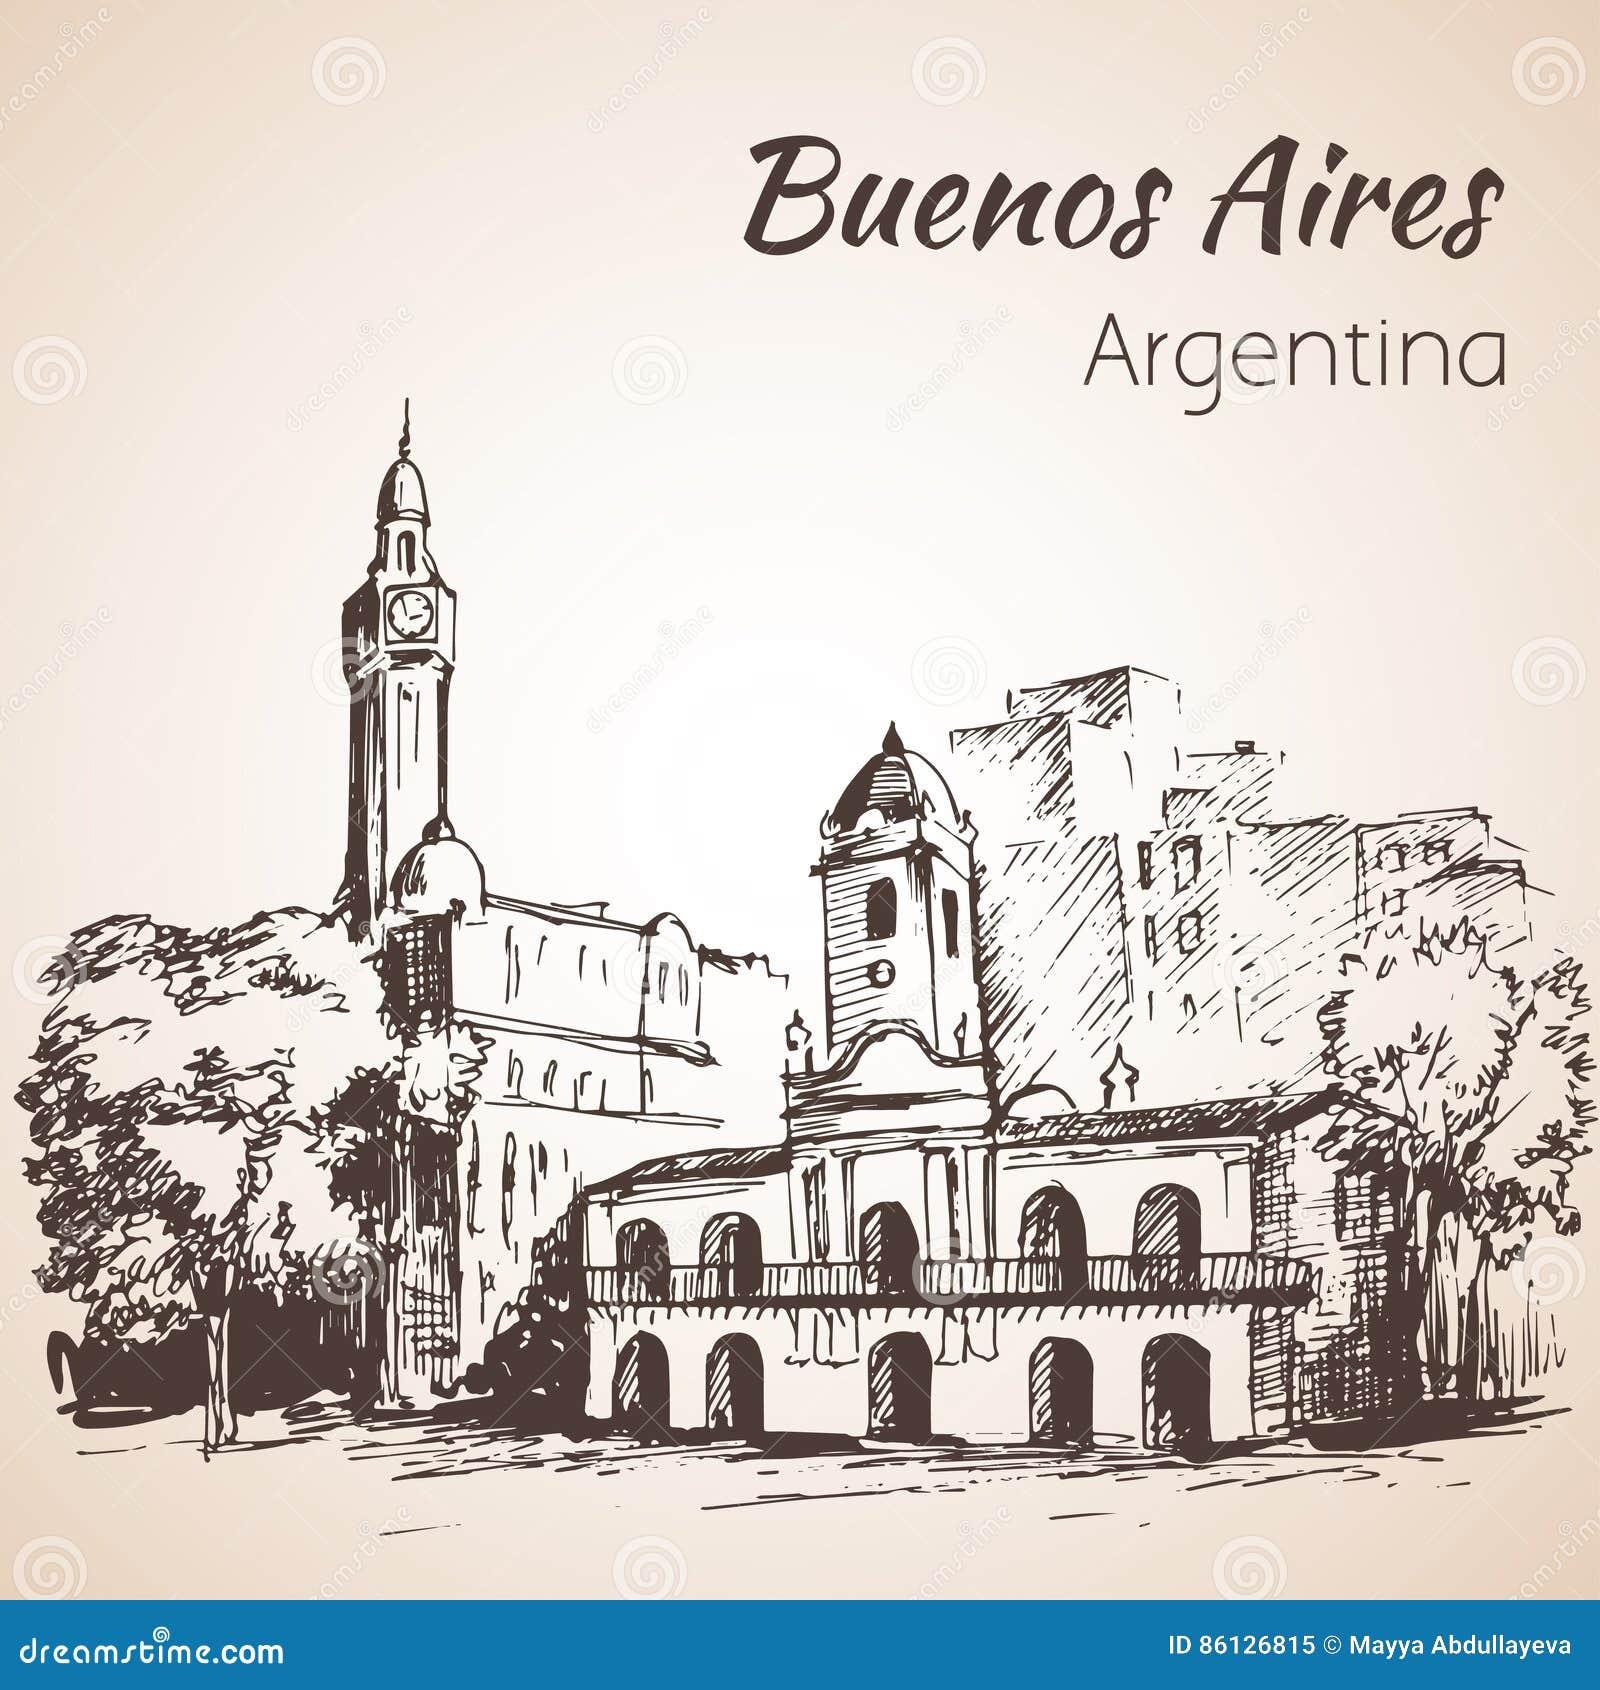 Buenos Aires stadsgata och fyrkant arenaceous skissa